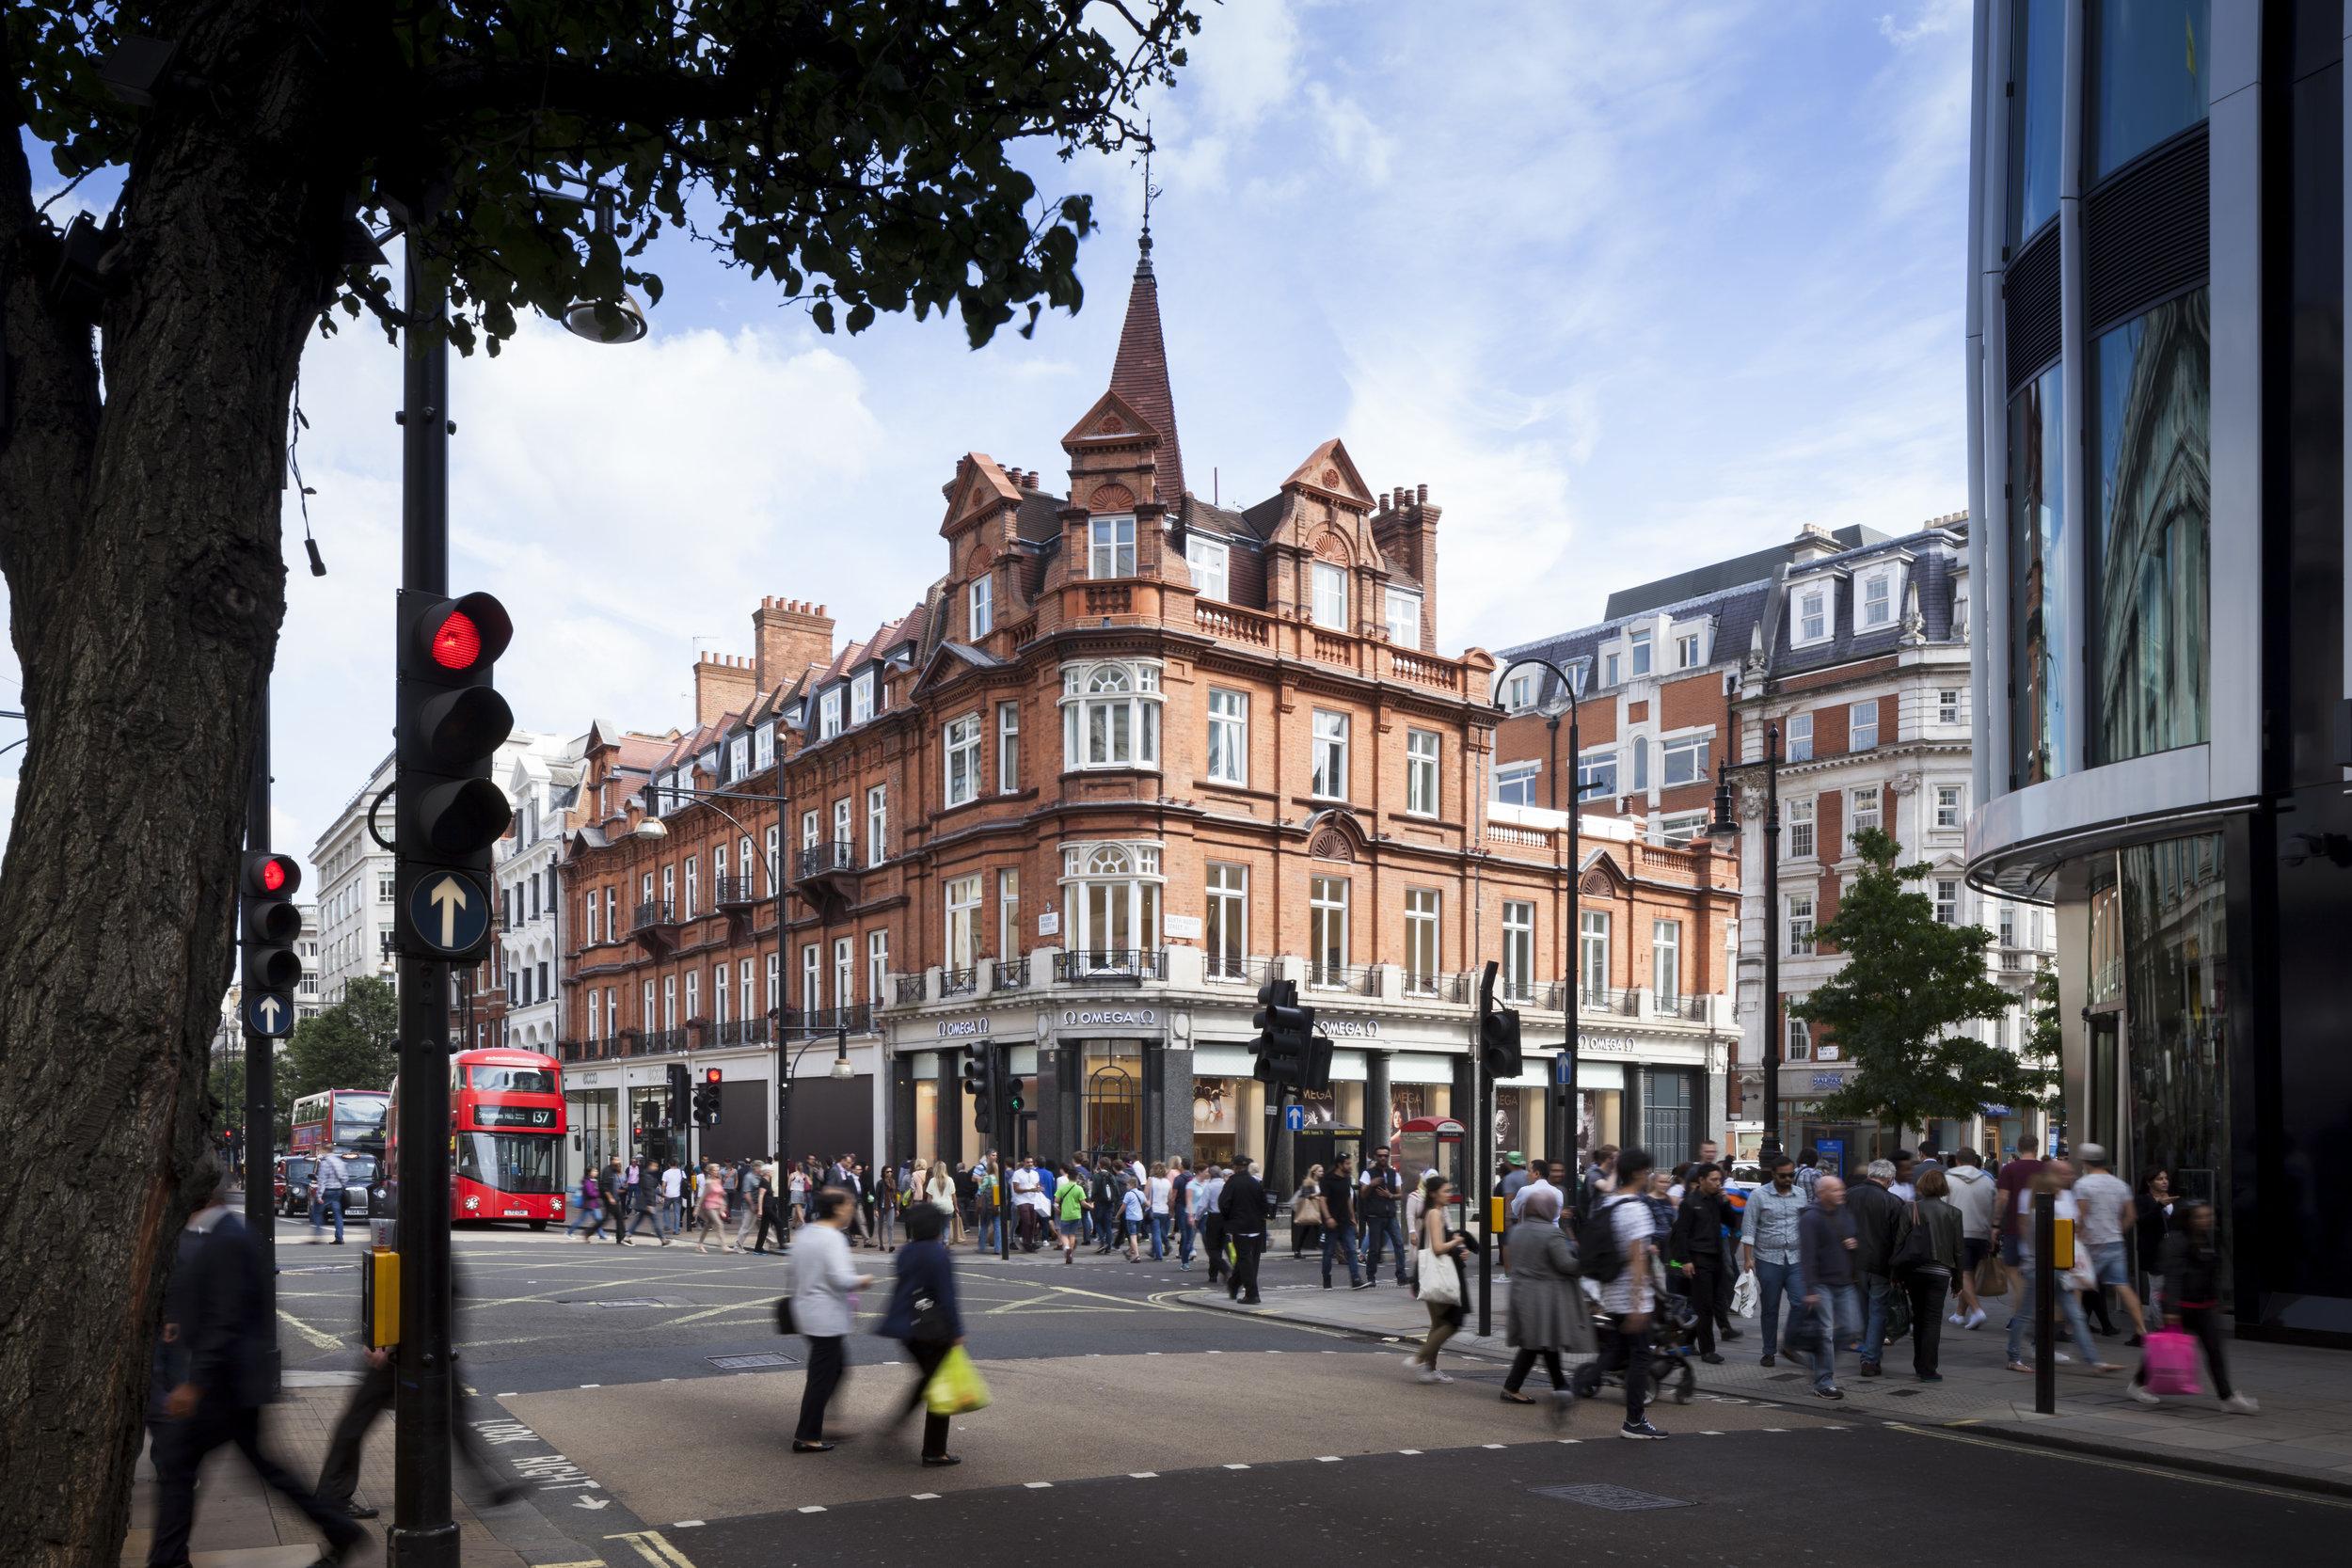 ESA Architects_439-451 Oxford Street_2015_06.jpg